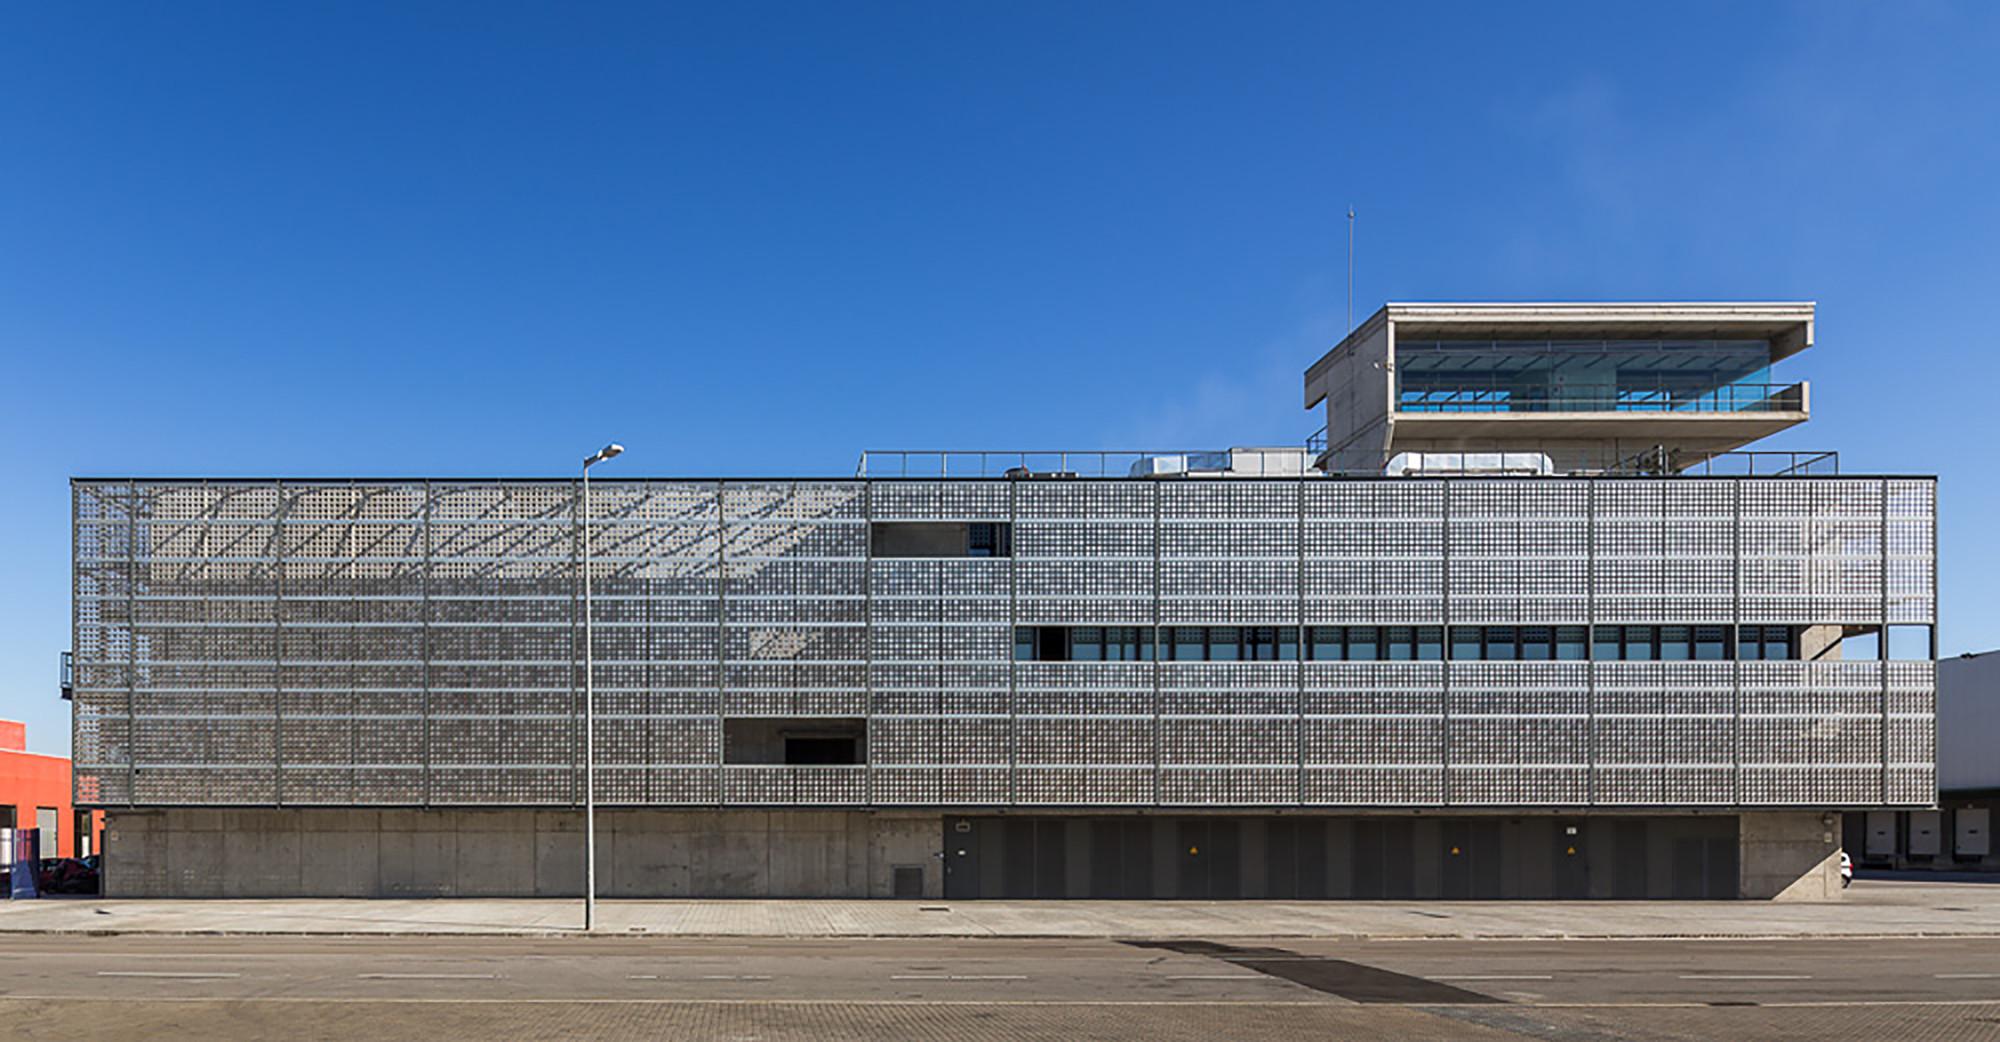 Barcelona Sur Power Generation Plant  / Forgas Arquitectes, © Simón García